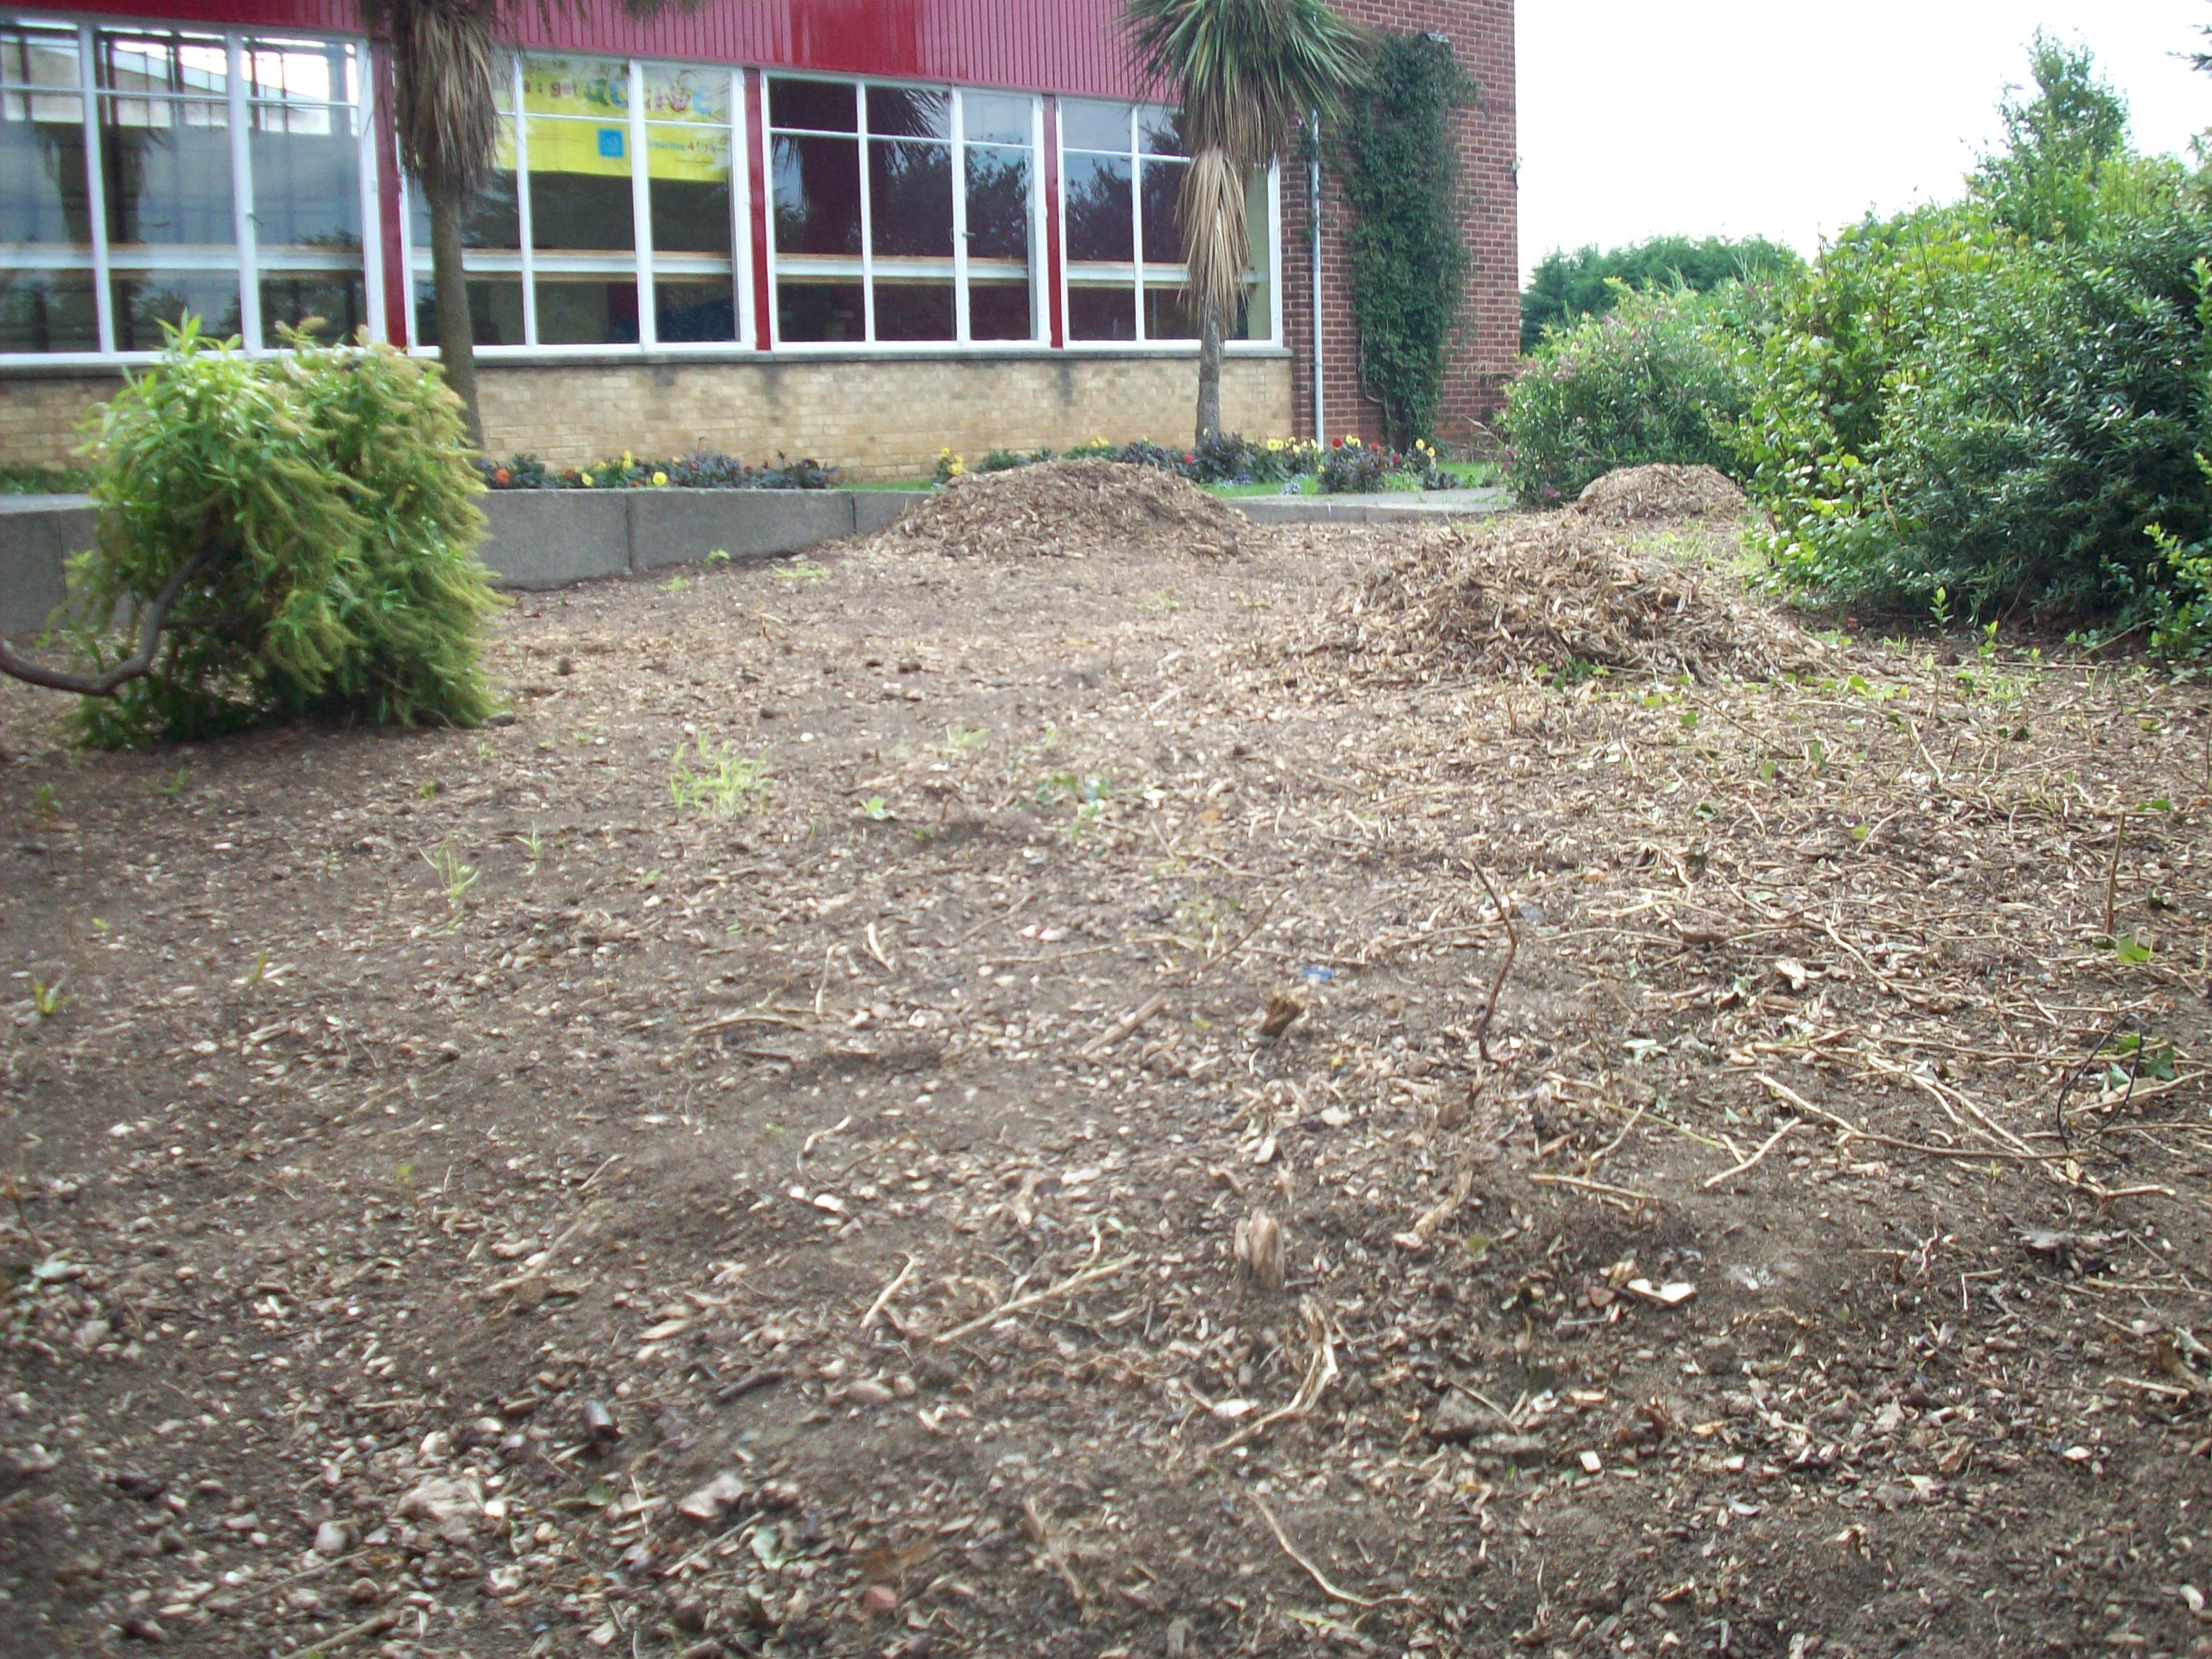 Second eco garden- before